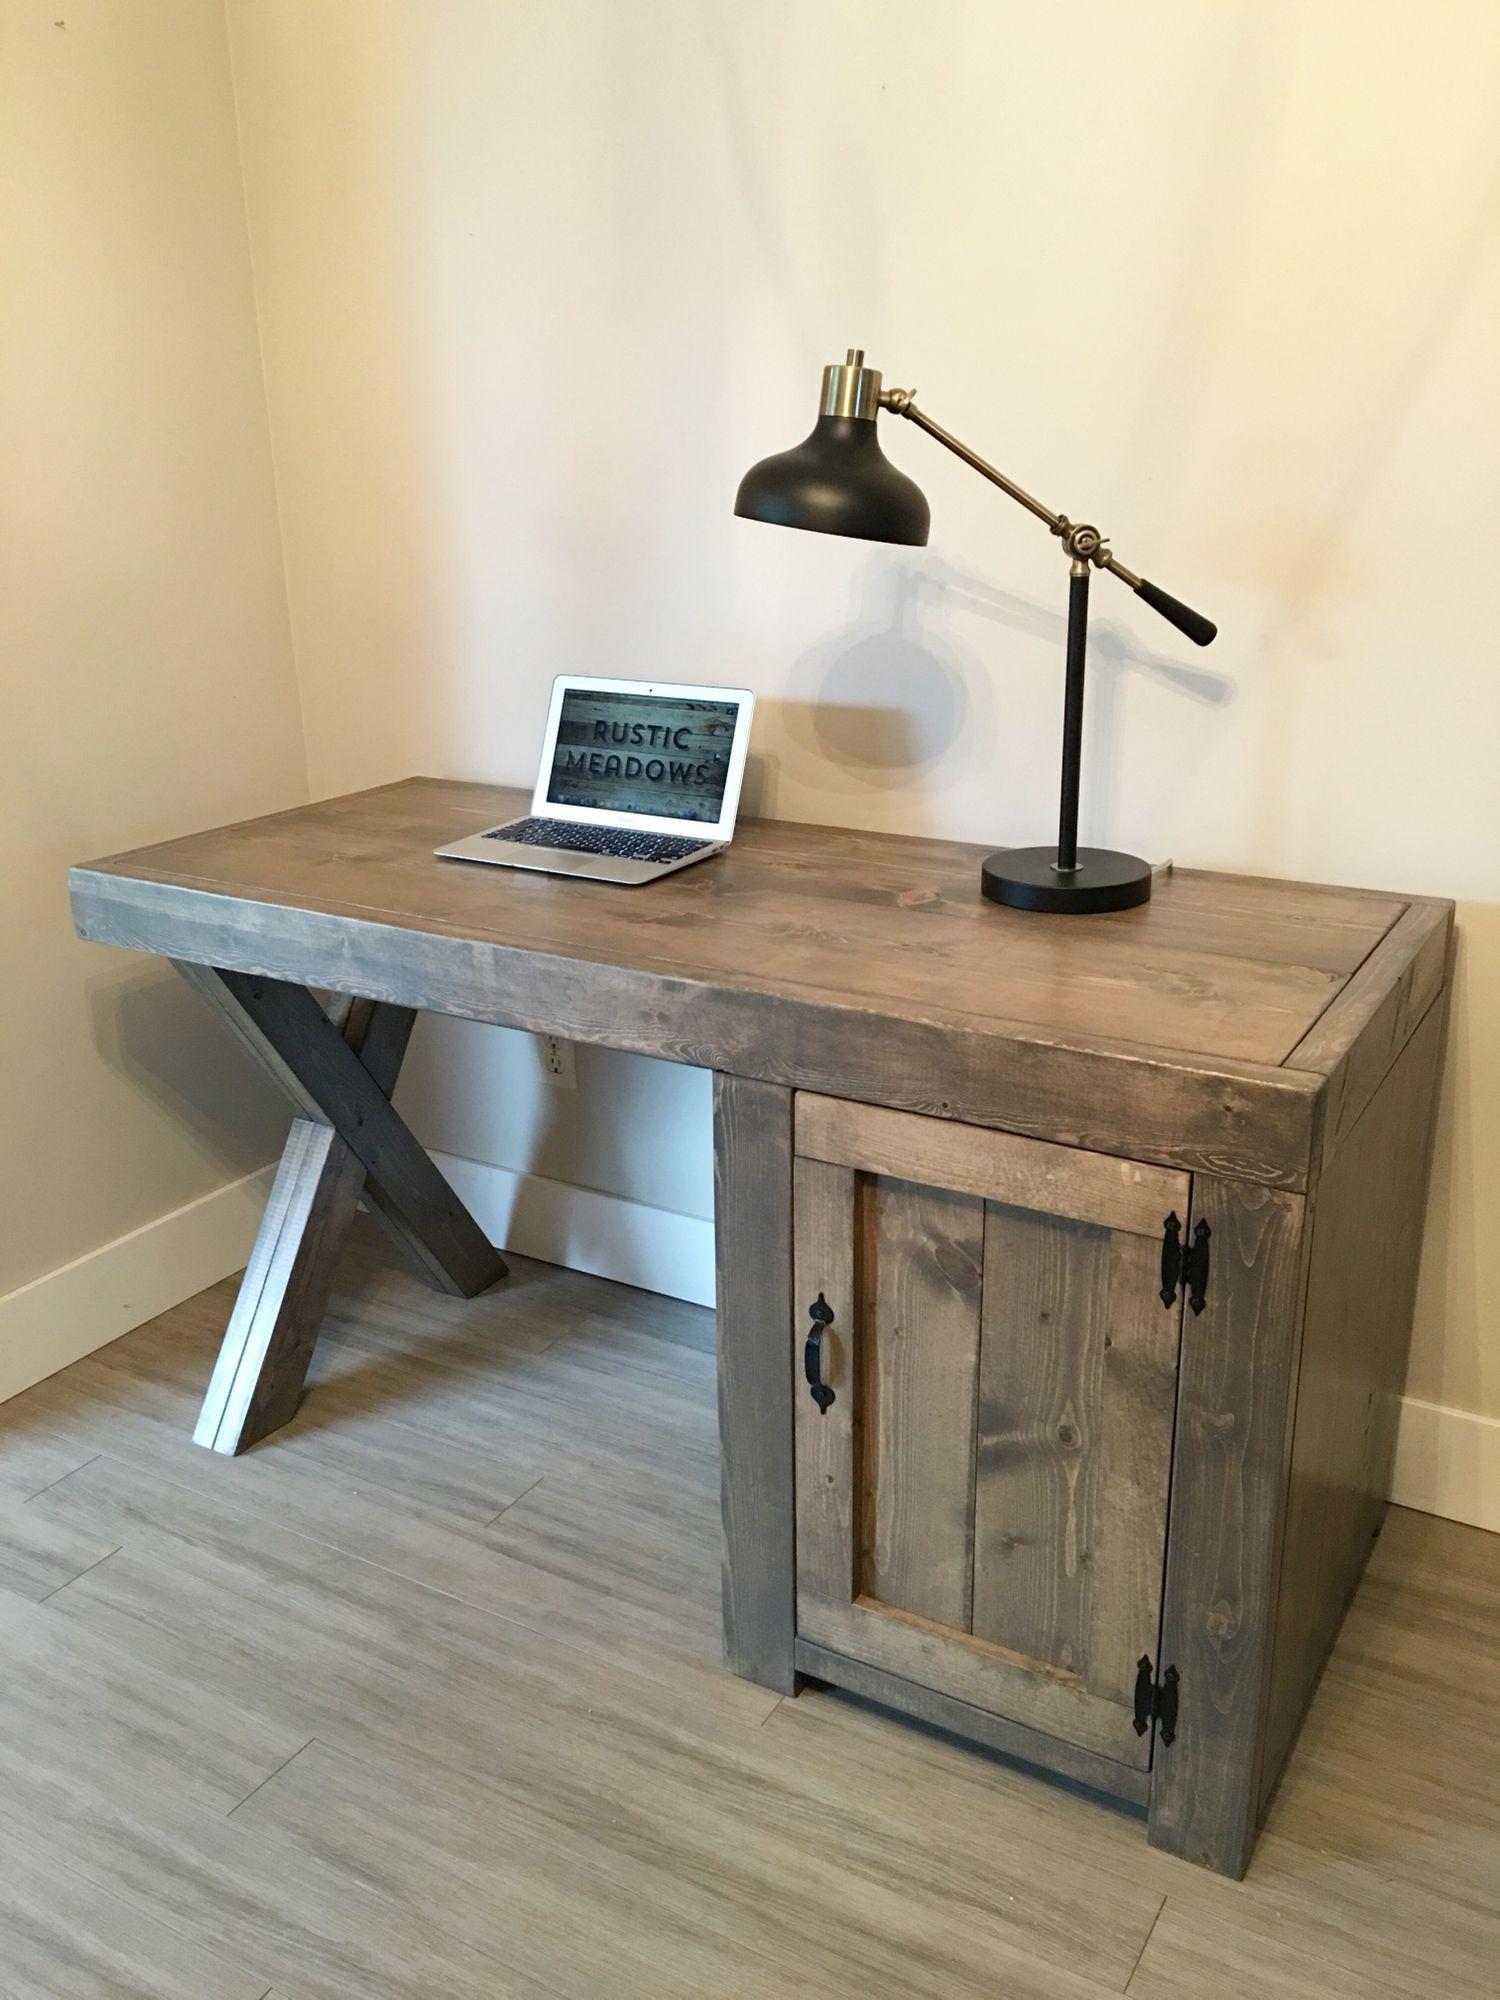 title | DIY computer desk